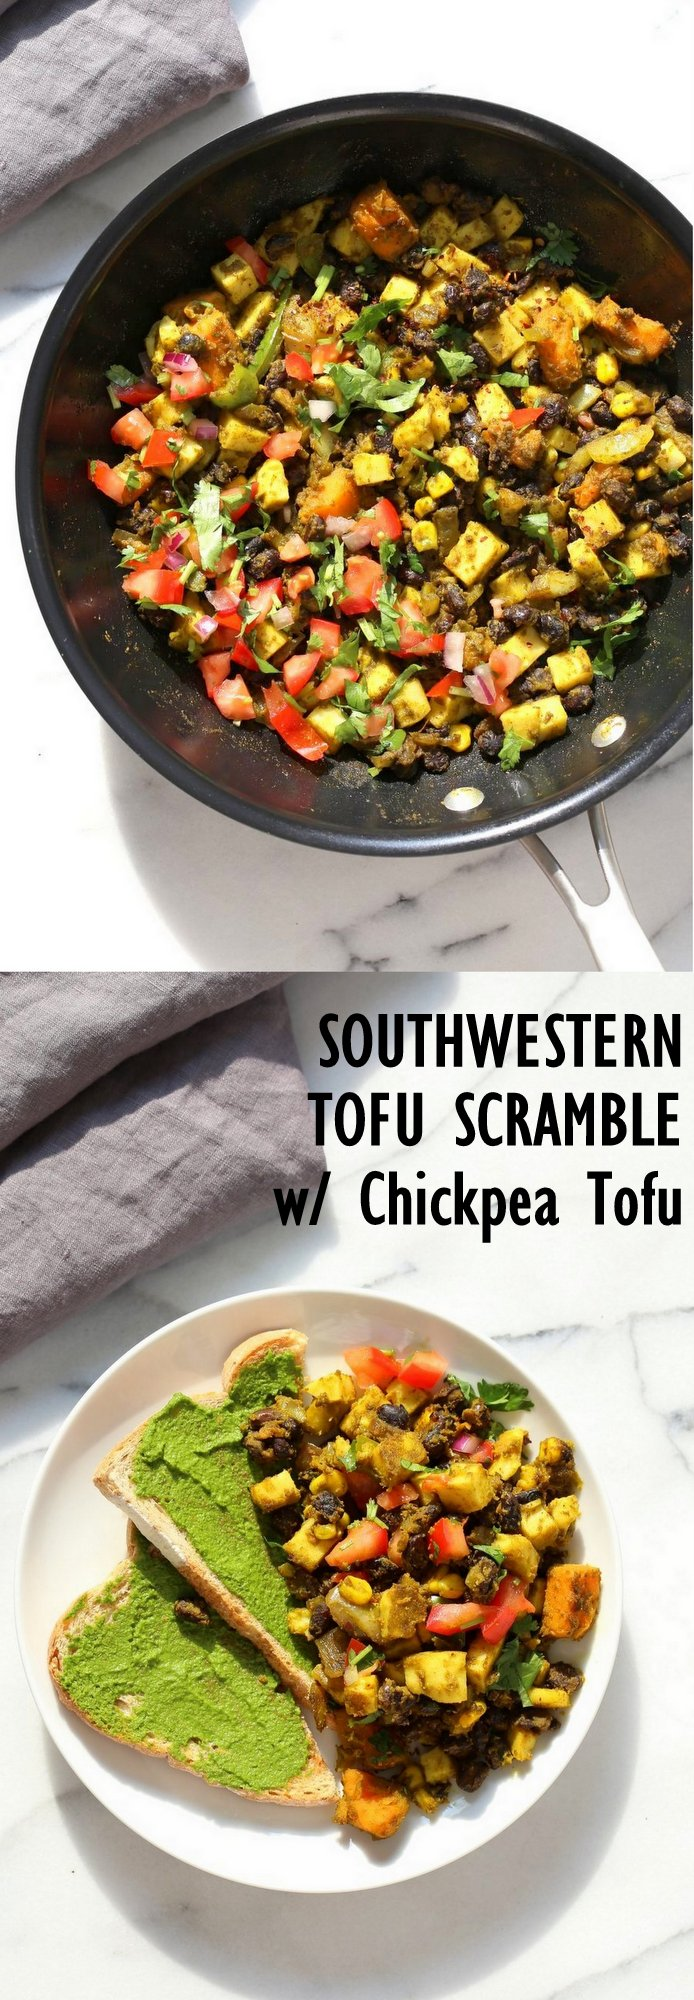 Southwestern Tofu Scramble with Chickpea Tofu. Scrambled Tofu without Soy tofu! Soy-free Breakfast Scramble with Black beans, Veggies, Sweet Potatoes, Spices, Chickpea flour Tofu. Double Protein Savory Vegan Breakfast. Gluten-free Soy-free Nut-free | VeganRicha.com